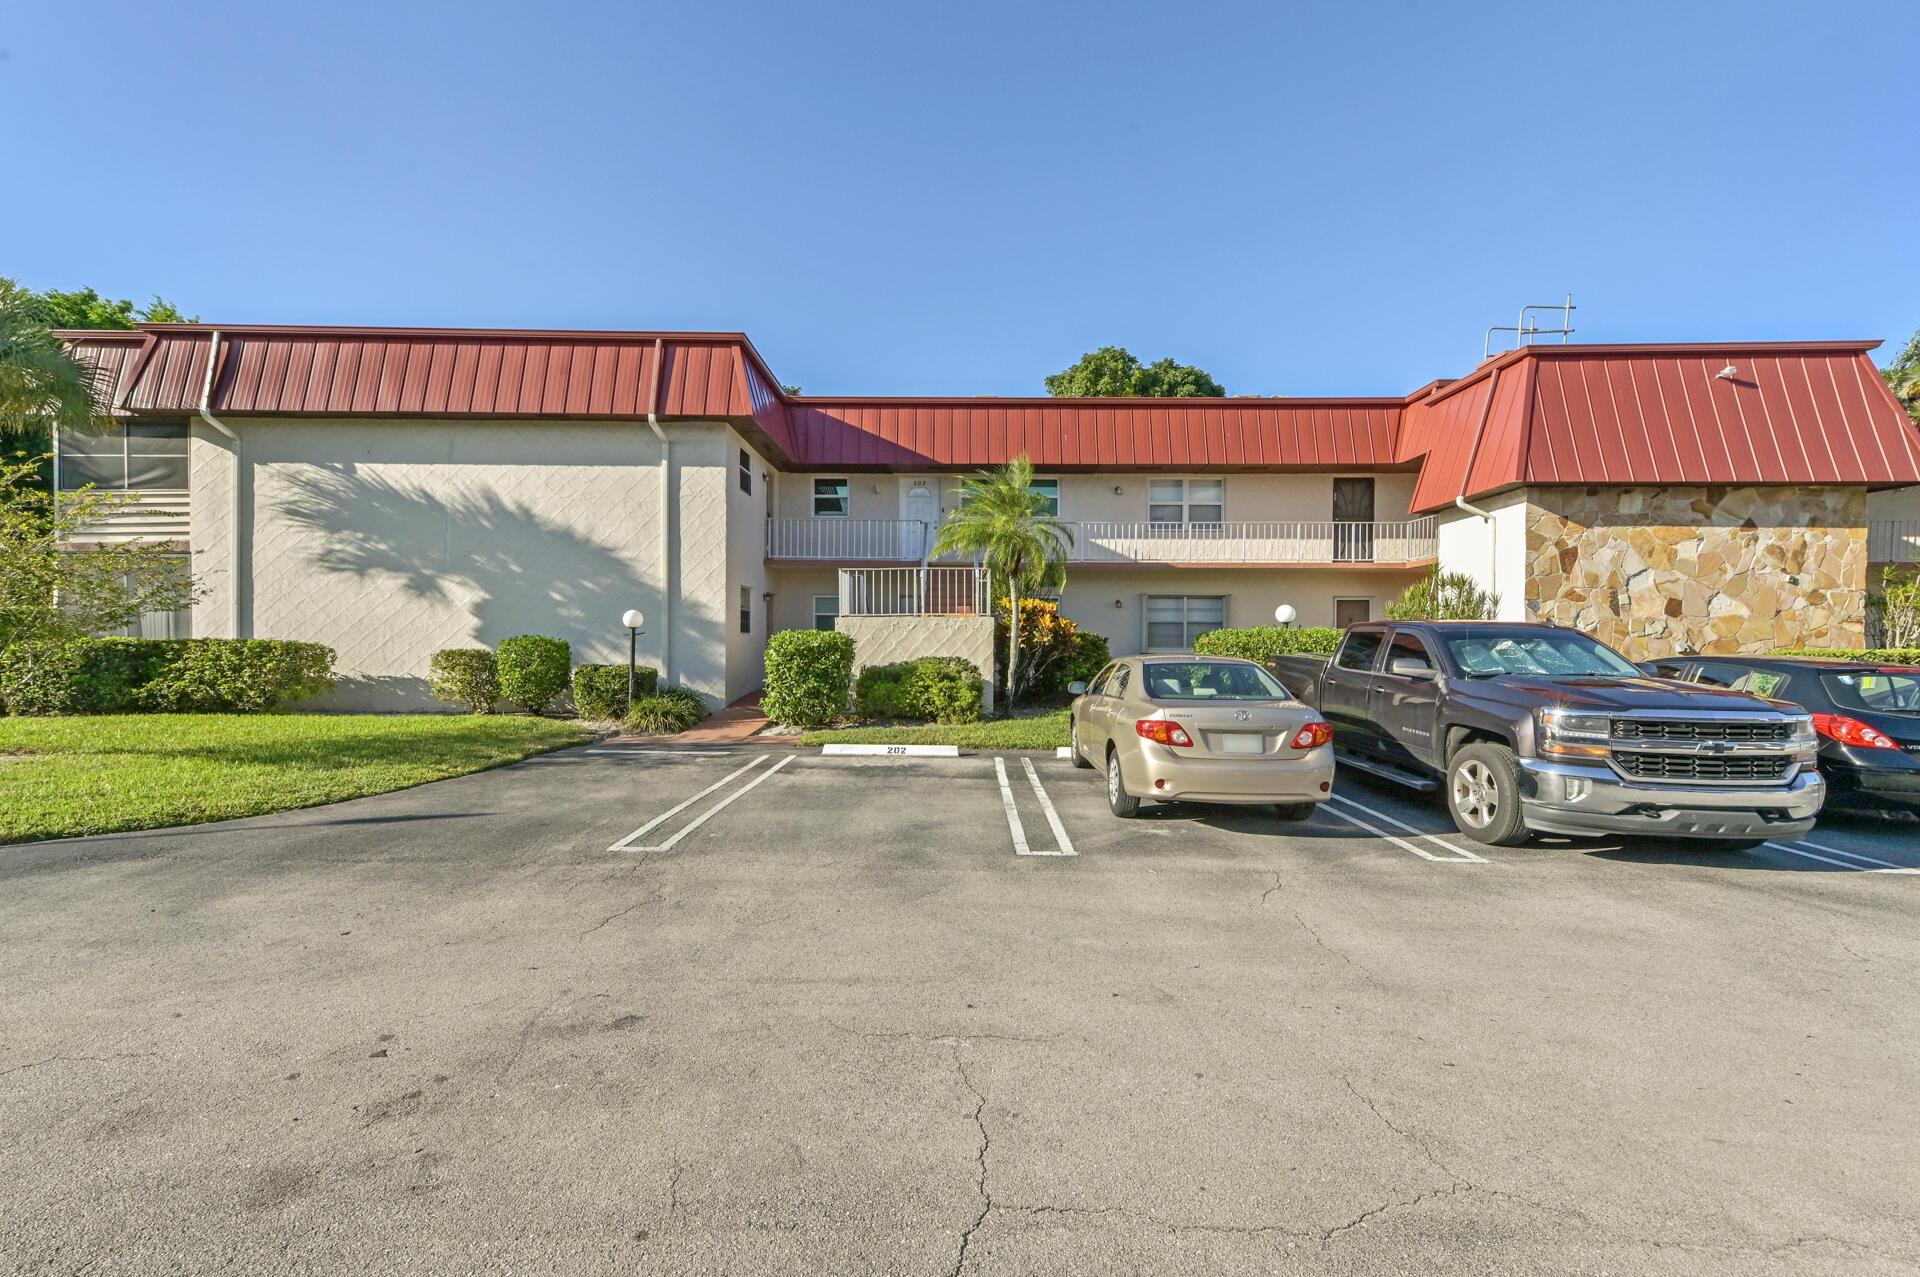 12027 Greenway Unit 201, Royal Palm Beach, Florida 33411